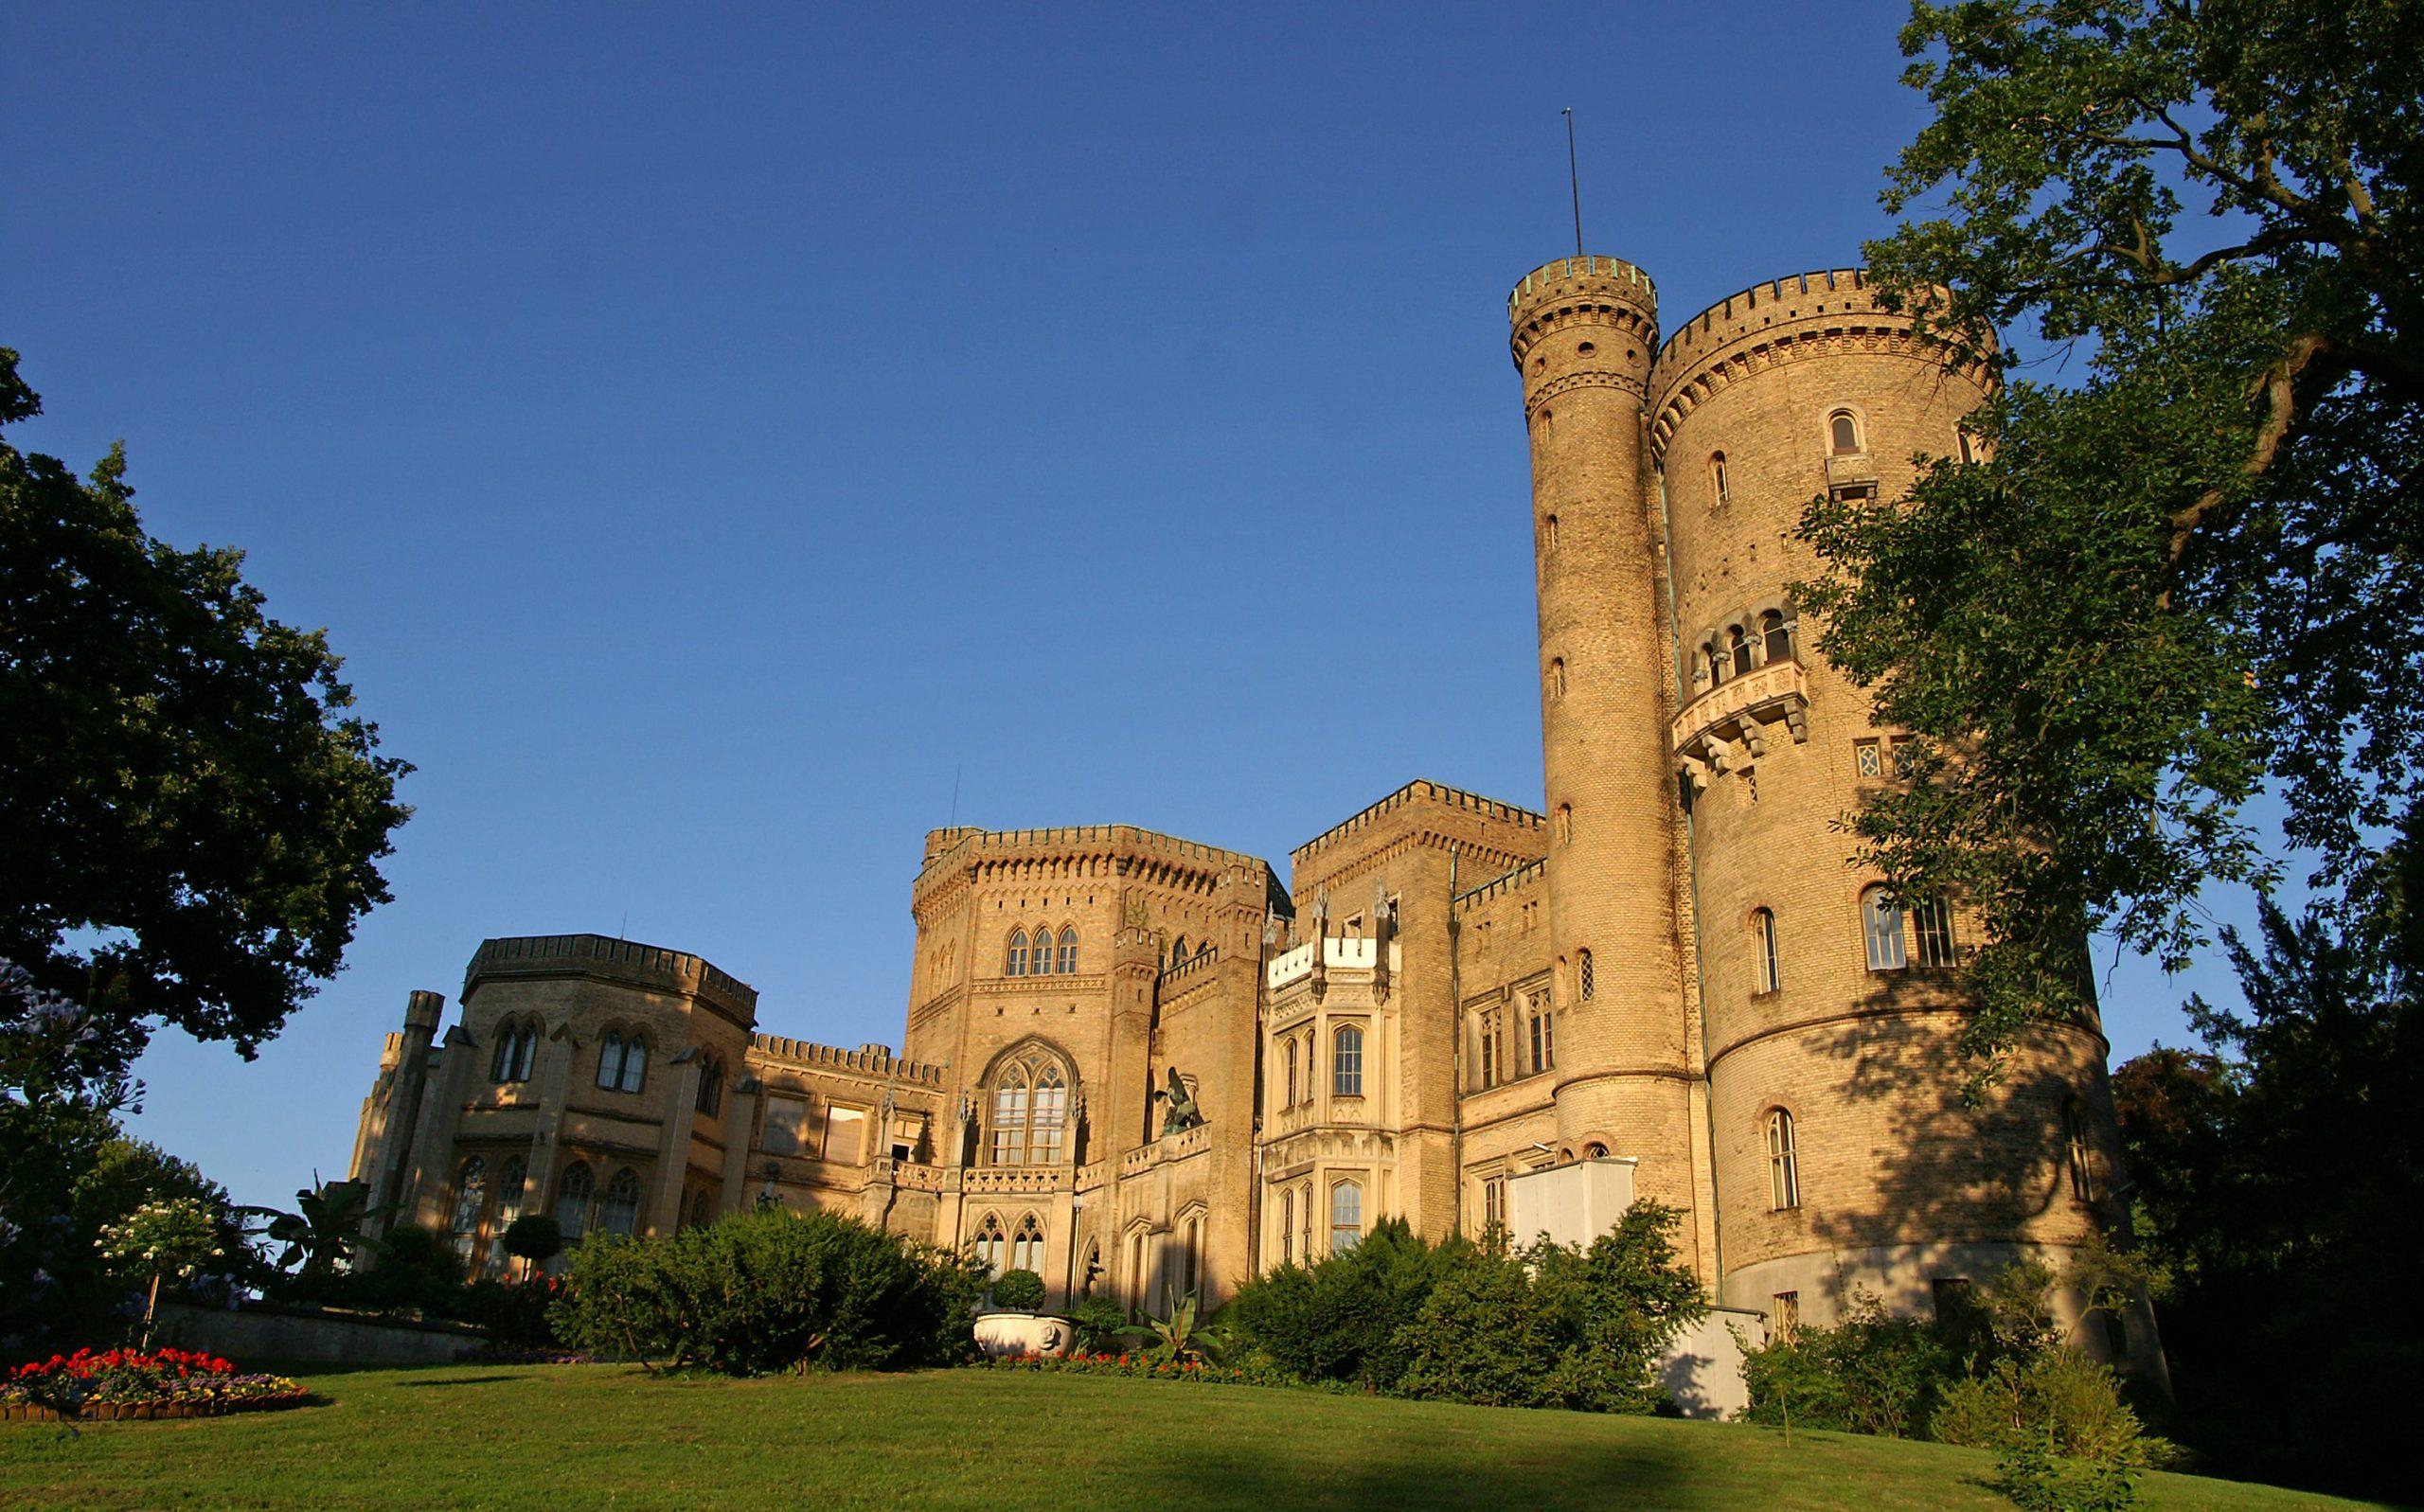 Babelsberg Castle and Park